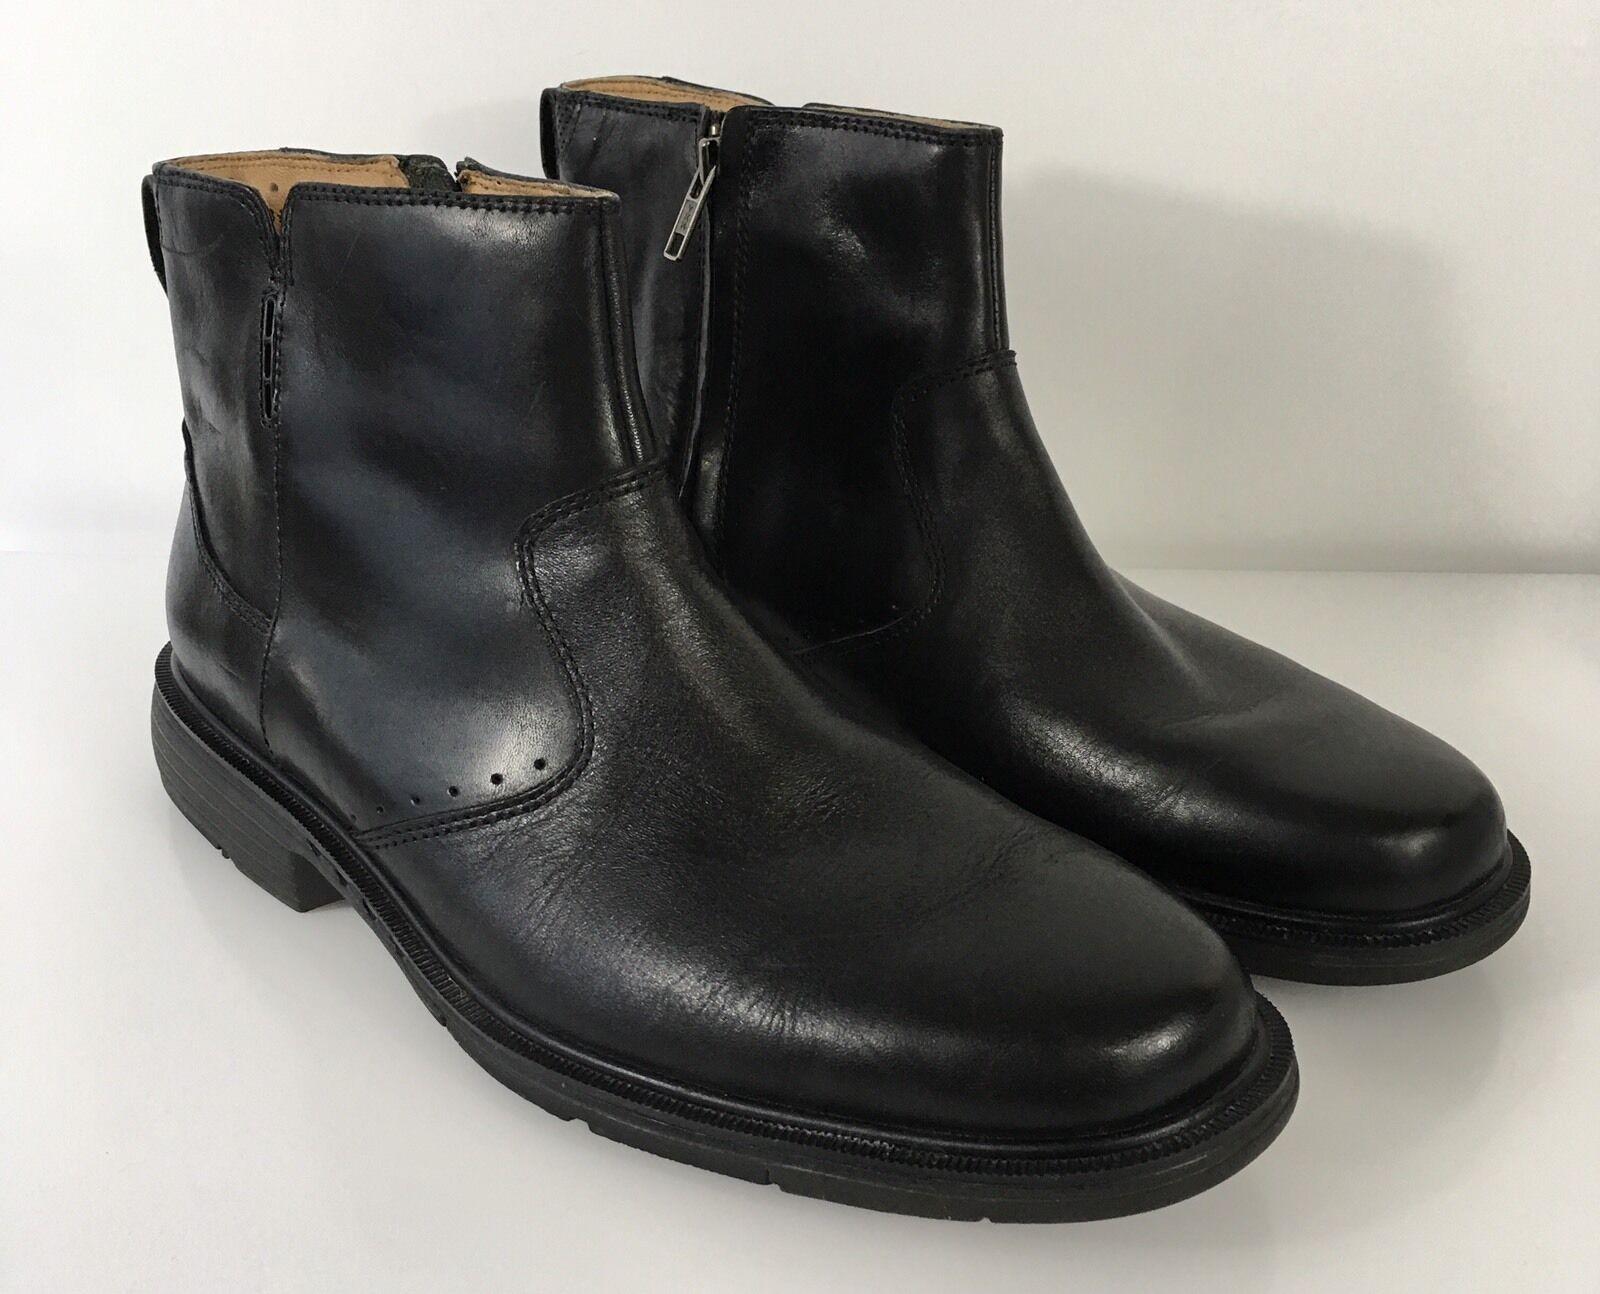 Clarks Unstructured Mens Sz 8.5M Black Leather Dress Ankle Boots